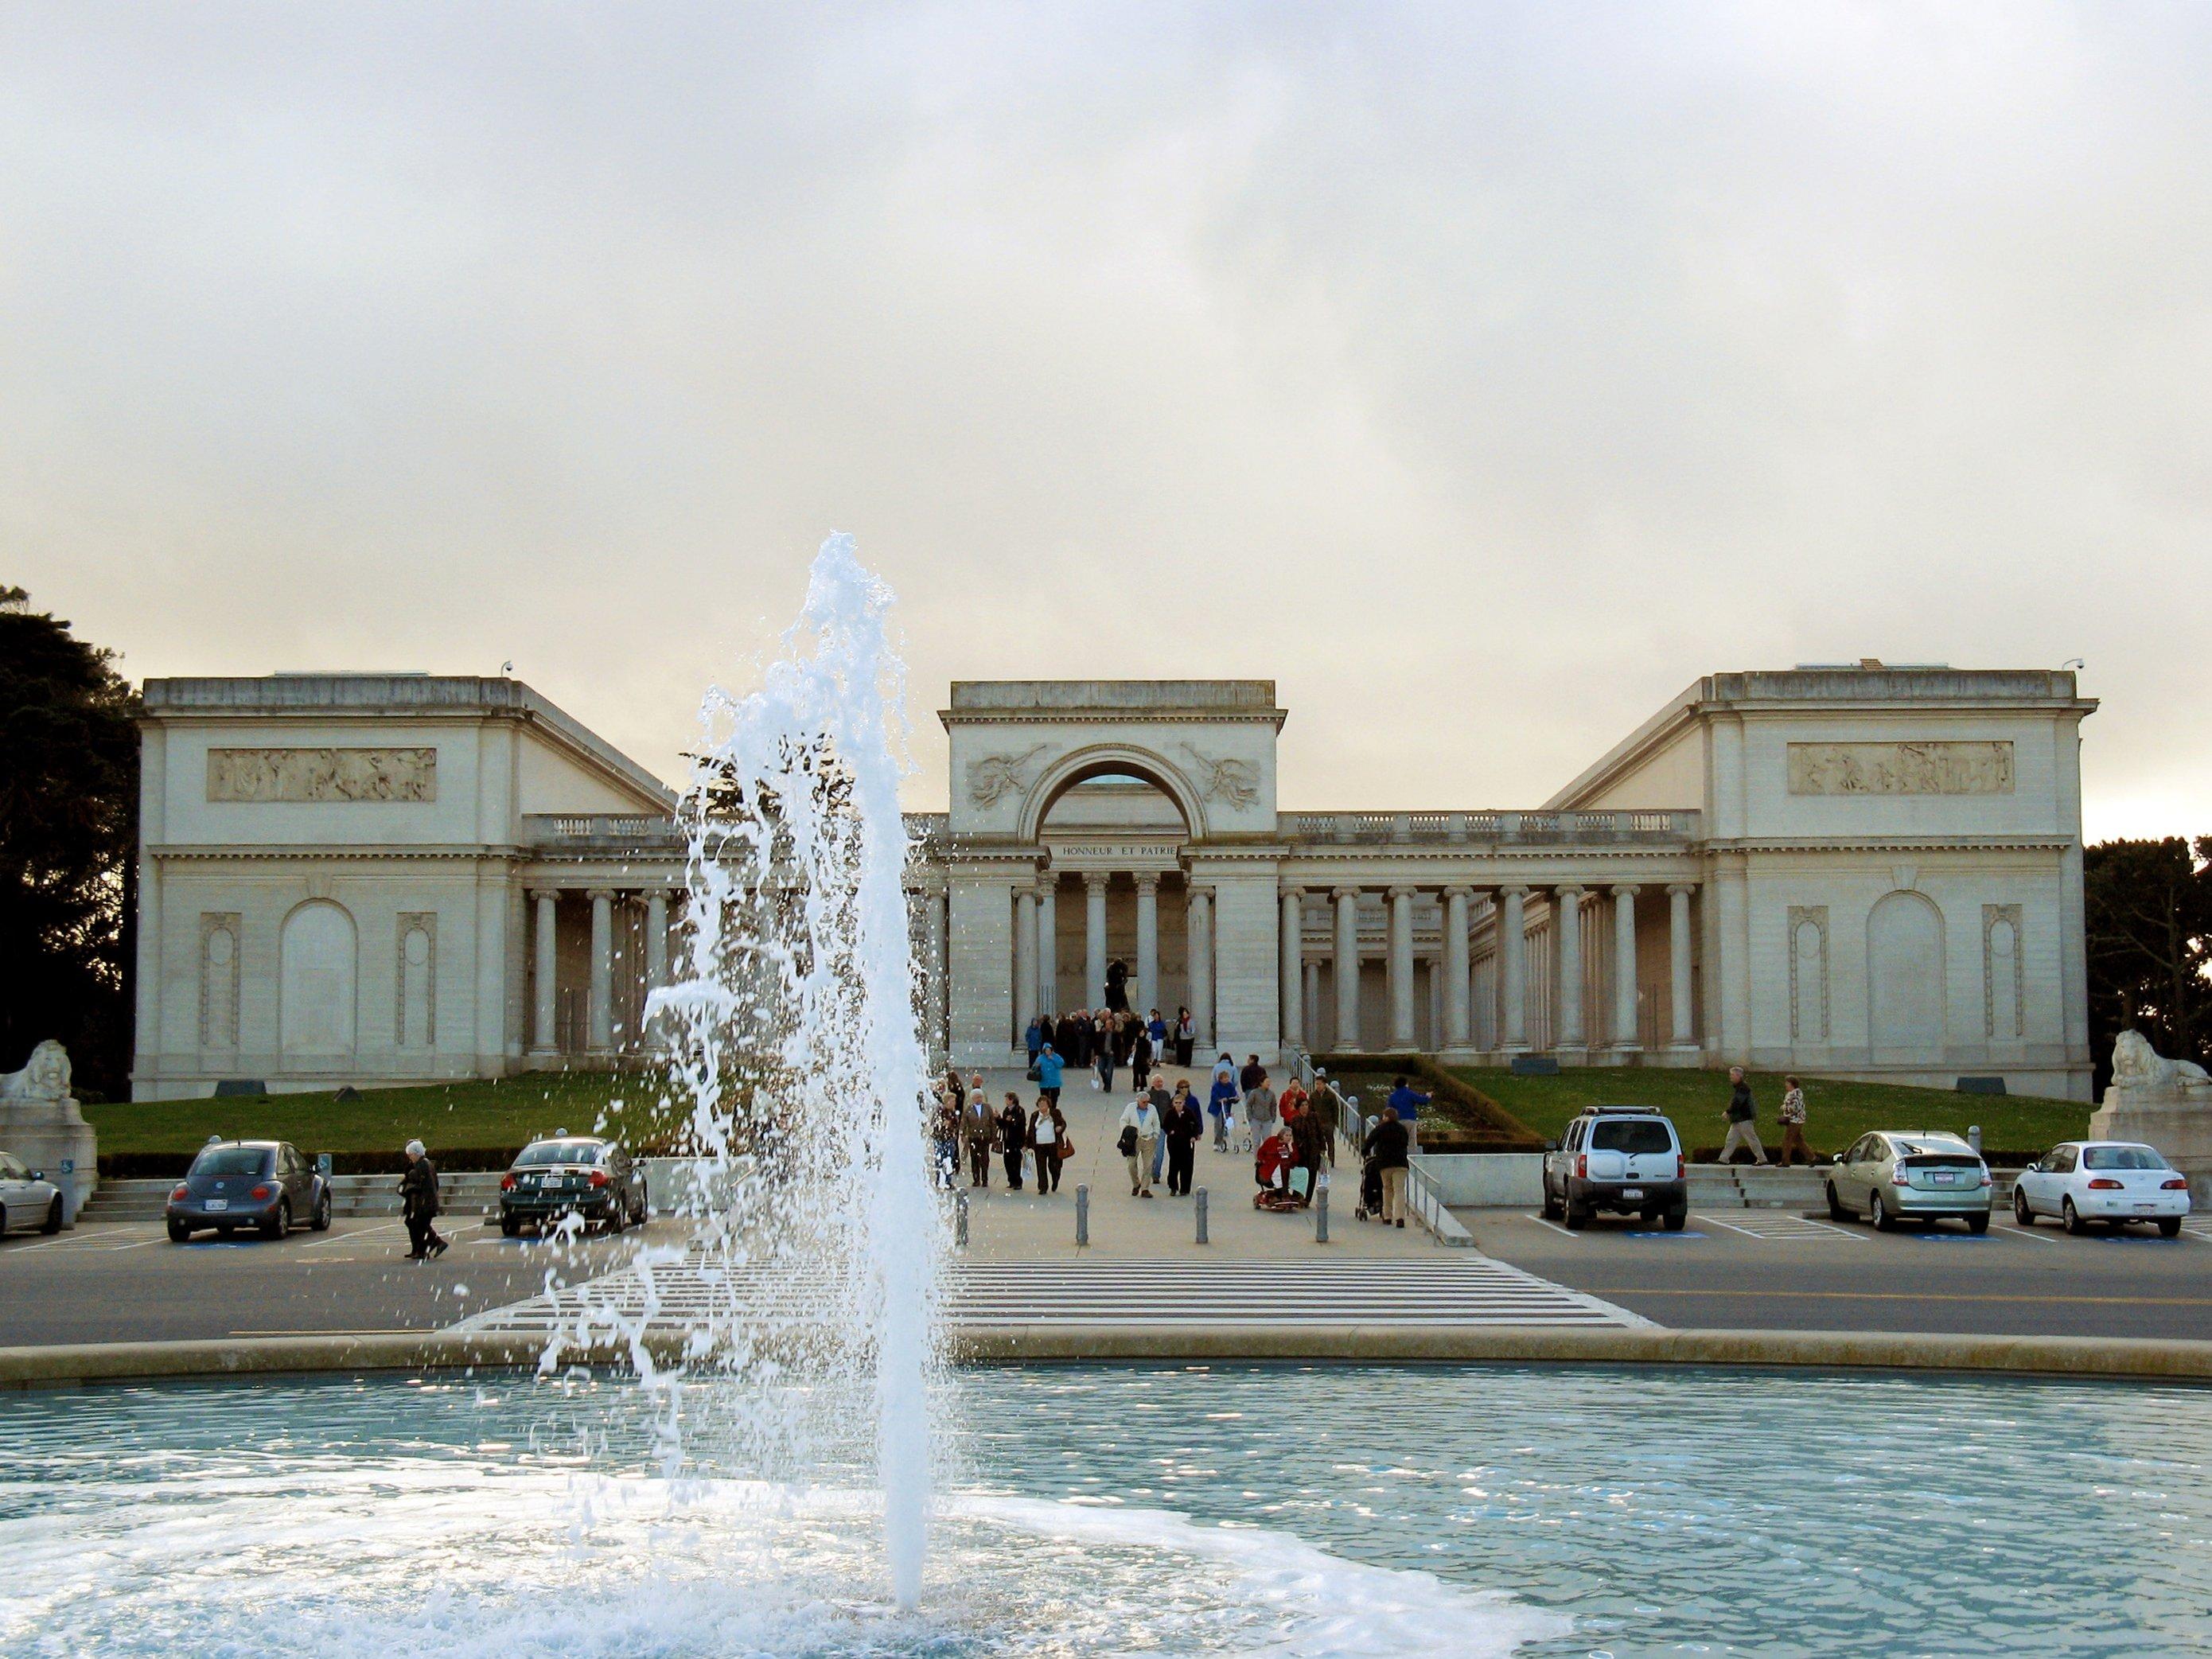 Музей дворца ордена Почетного легиона, в Сан-Франциско